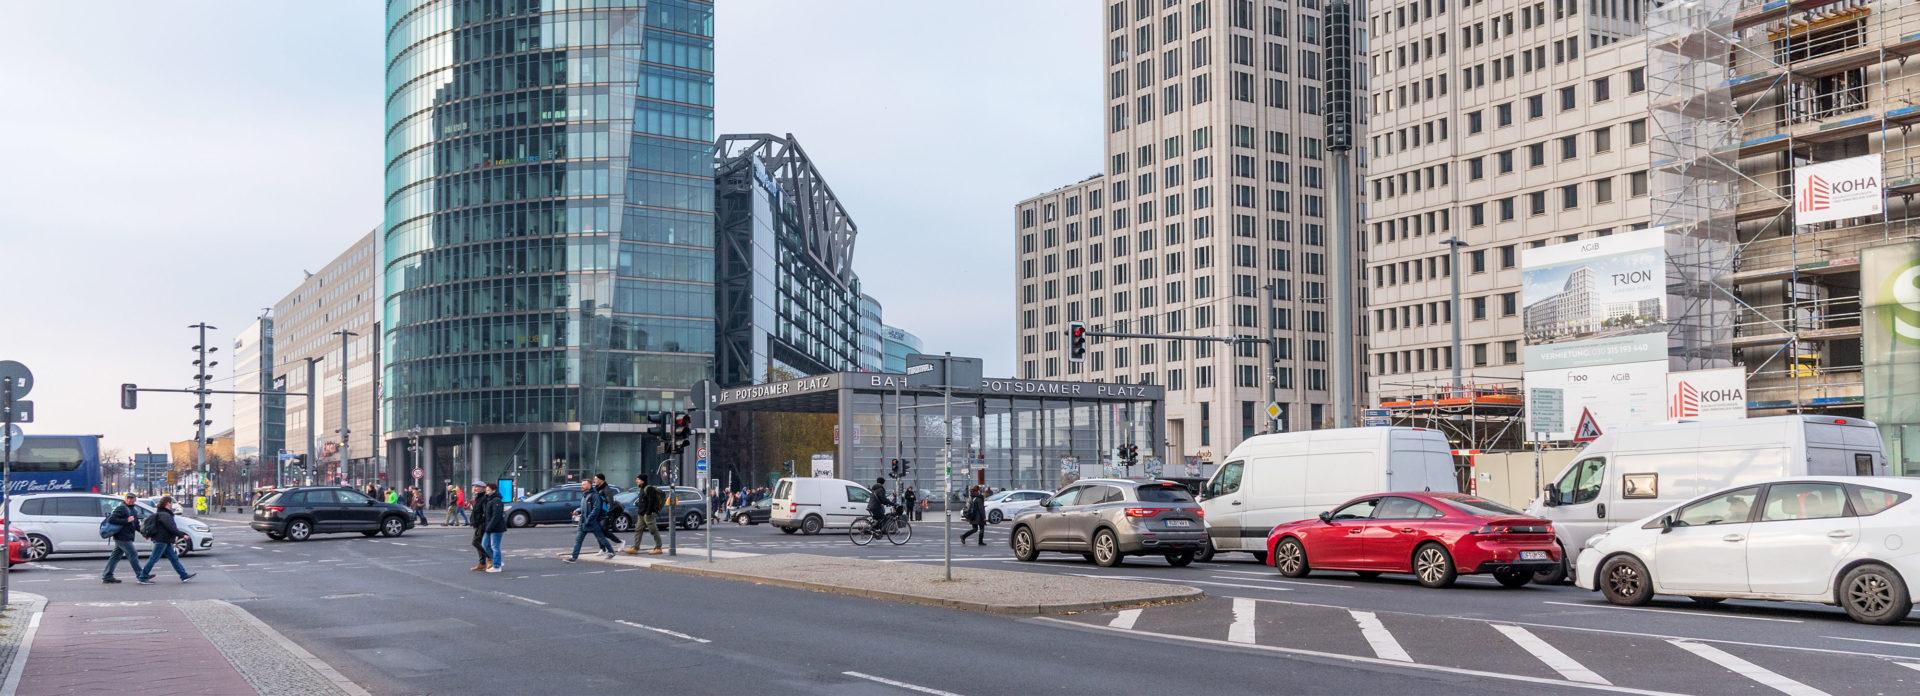 Potsdamer Platz Berlin shopping severdighet